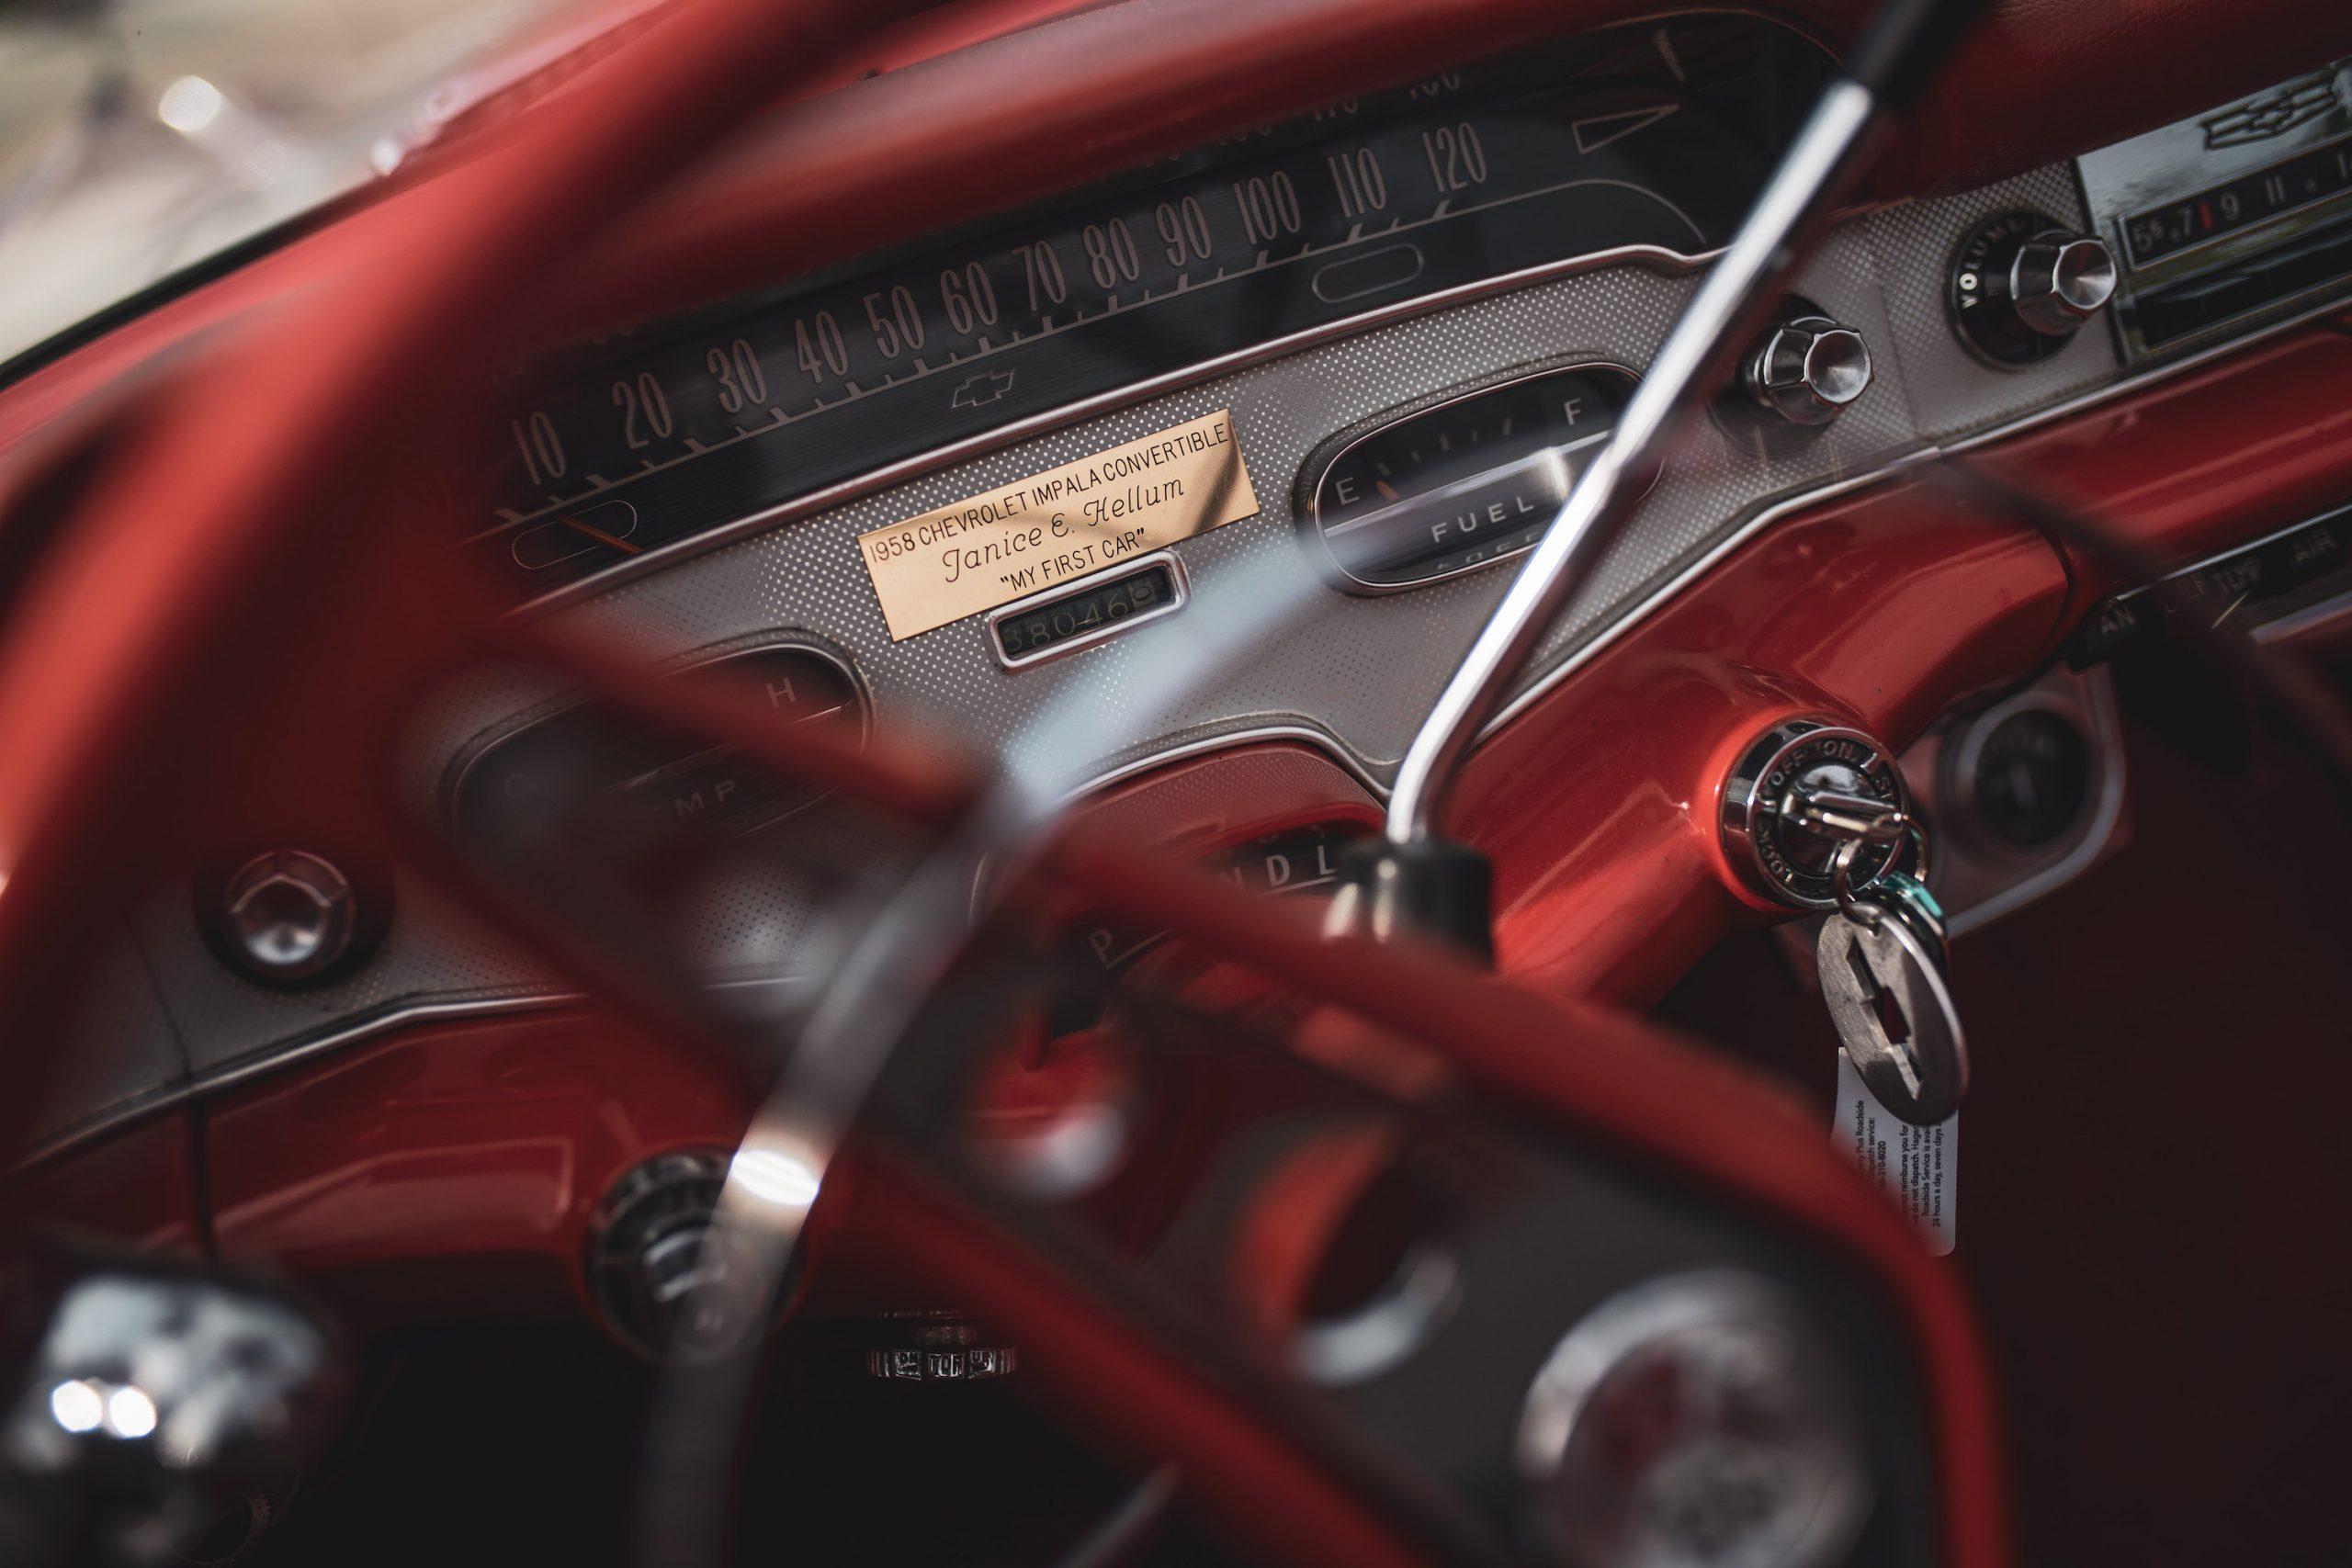 1958 Chevrolet Impala Convertible Dash